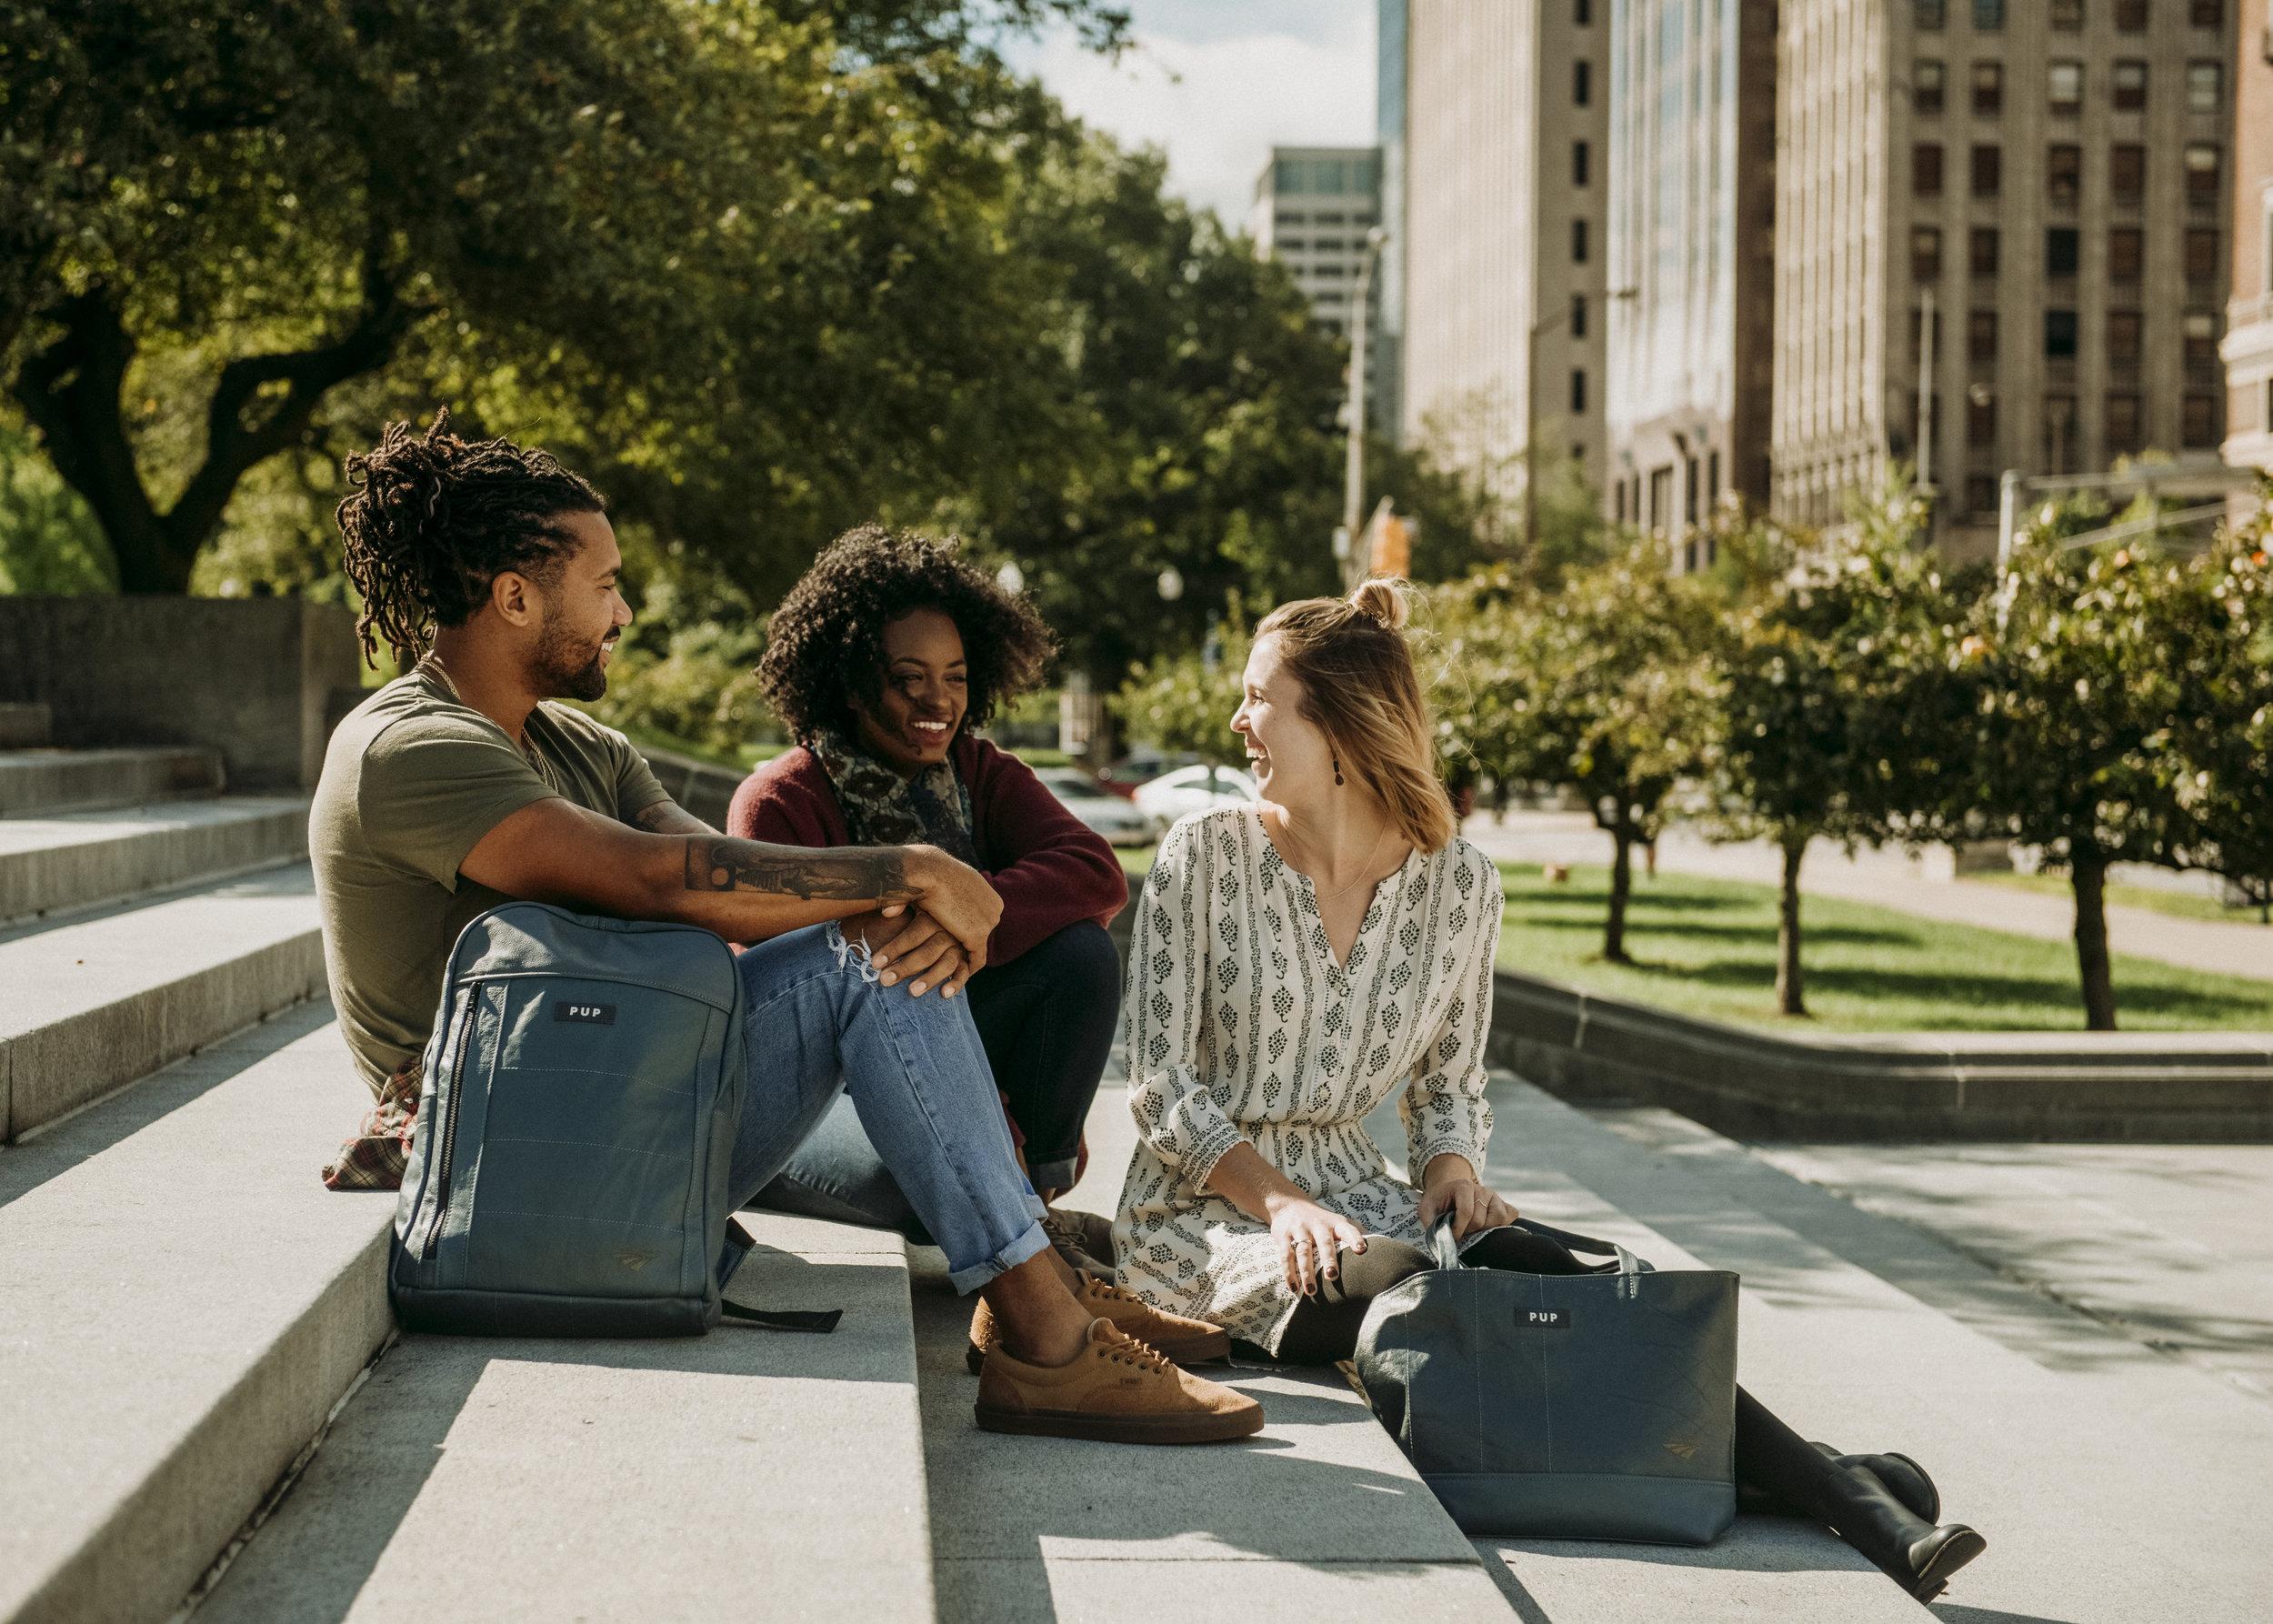 People for Urban Progress x Amtrak sustainability collaboration